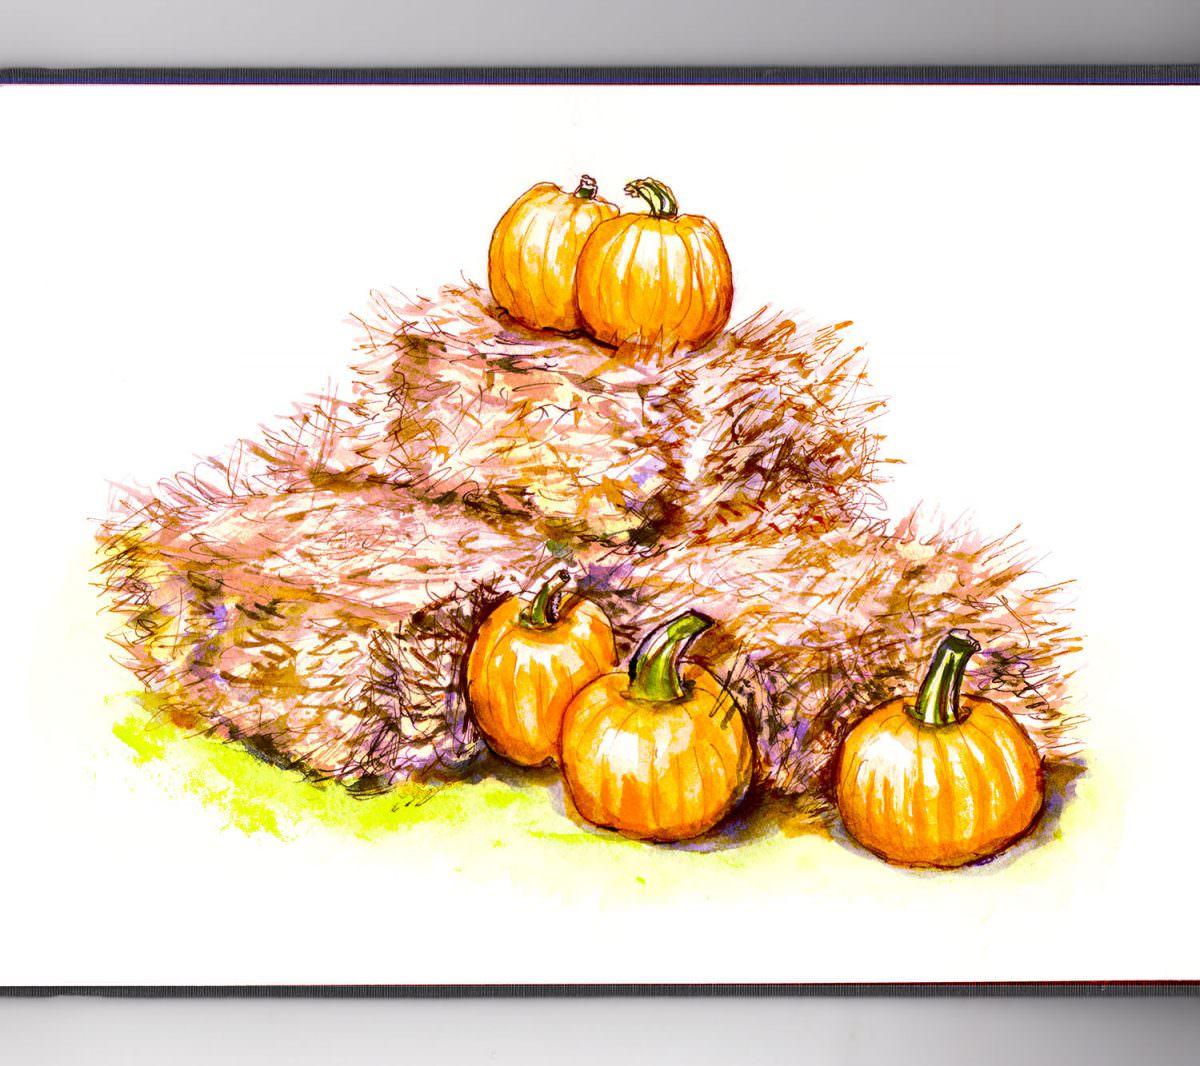 #WorldWatercolorGroup - Day 4 _ Pumpkins In The Hay Watercolor - Doodlewash